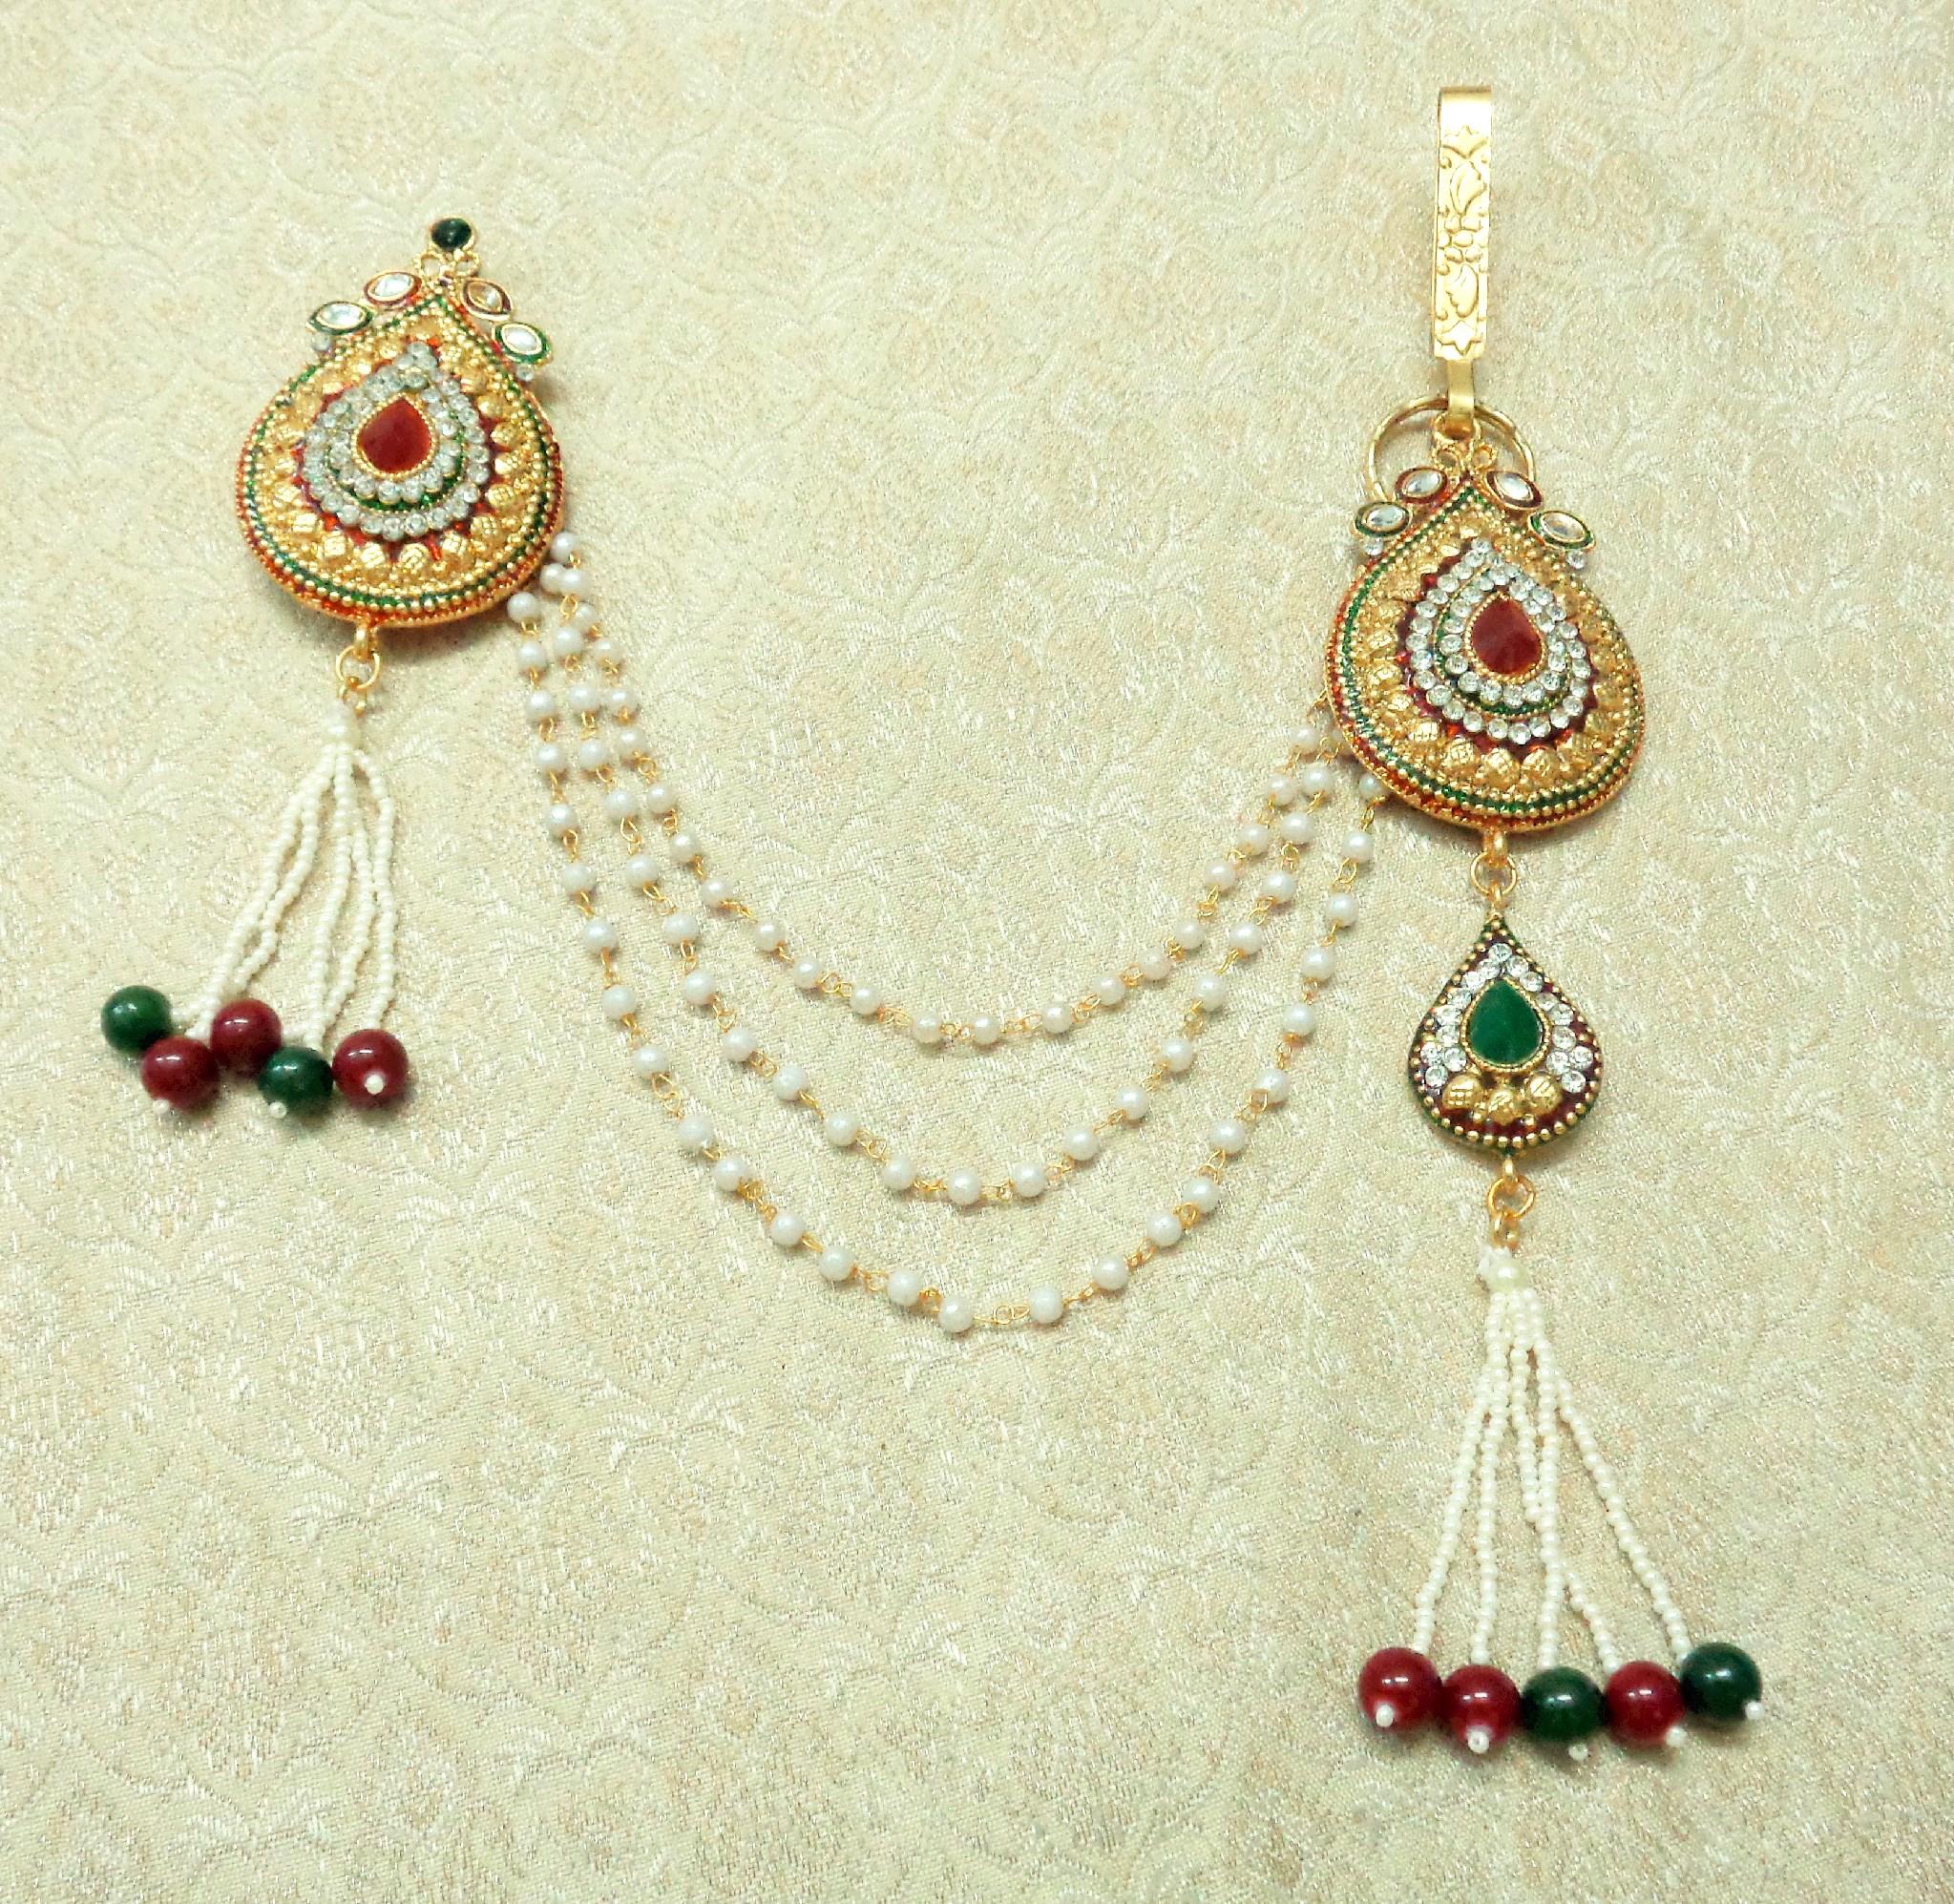 a1c1cb156 Multi-colour Stone Meenakari Gold plated Sareepin Brooch juda Kamarband for  wedding Festival - LSPJ04_MG - LALSO - 2756397